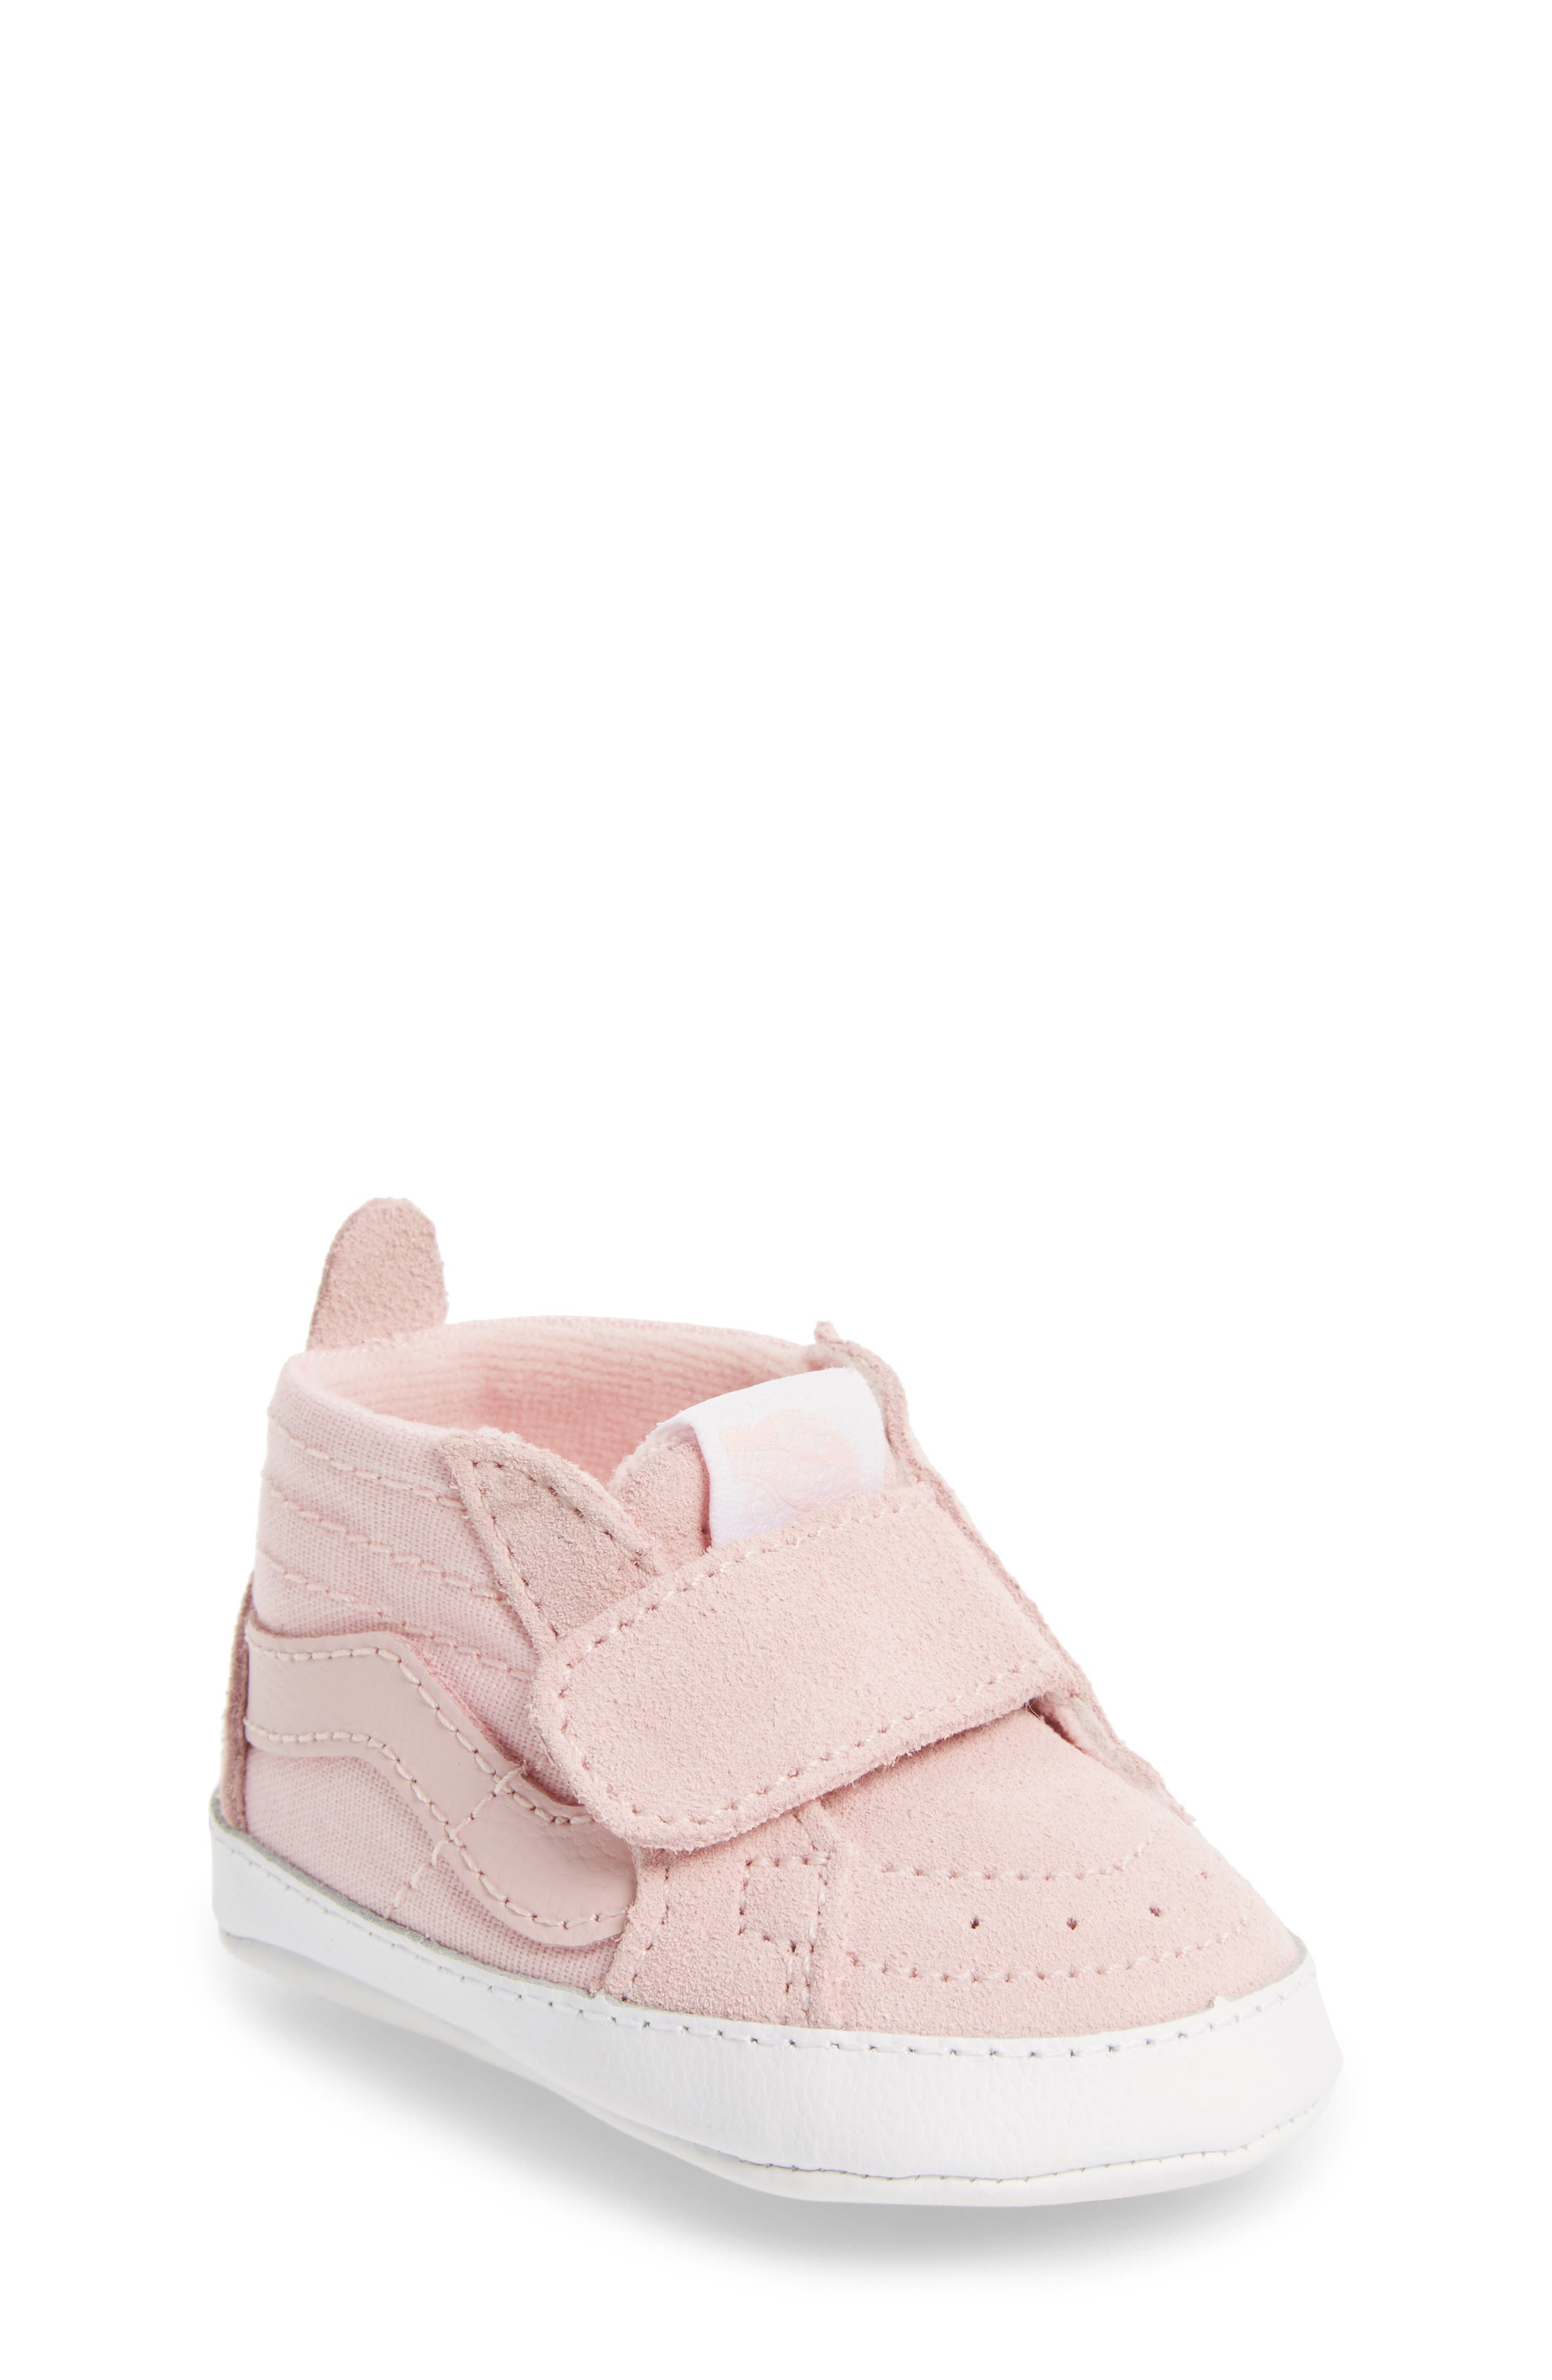 Alternate Image 1 Selected - Vans SK8-Hi Crib Sneaker (Baby)